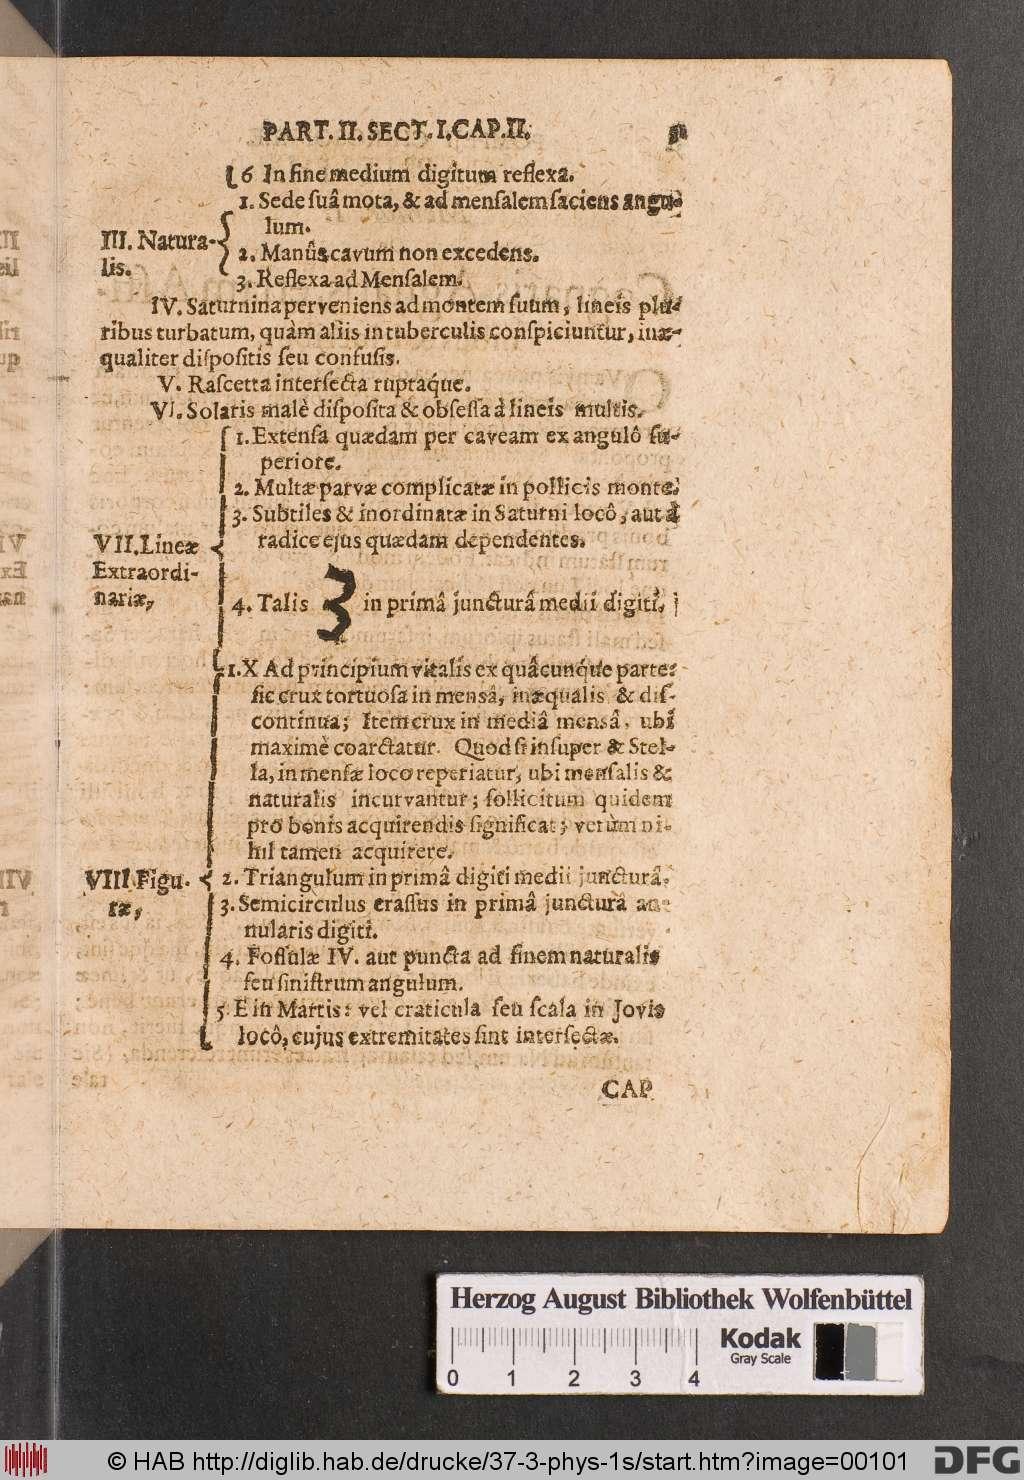 http://diglib.hab.de/drucke/37-3-phys-1s/00101.jpg